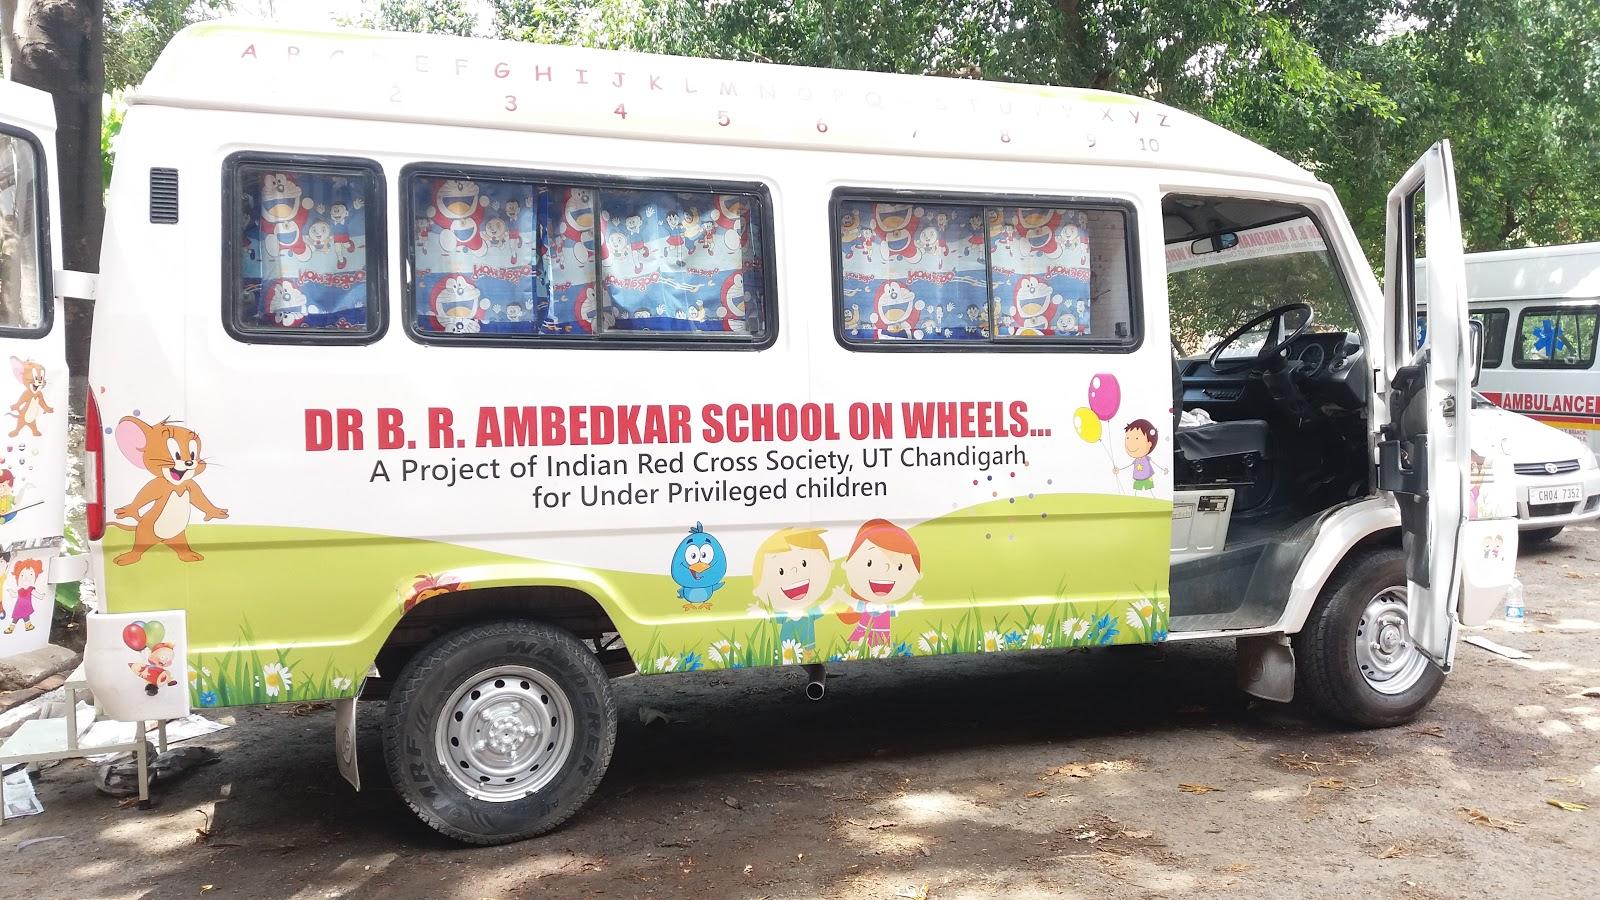 blood bank Indian Red Cross Society near Chandigarh Punjab